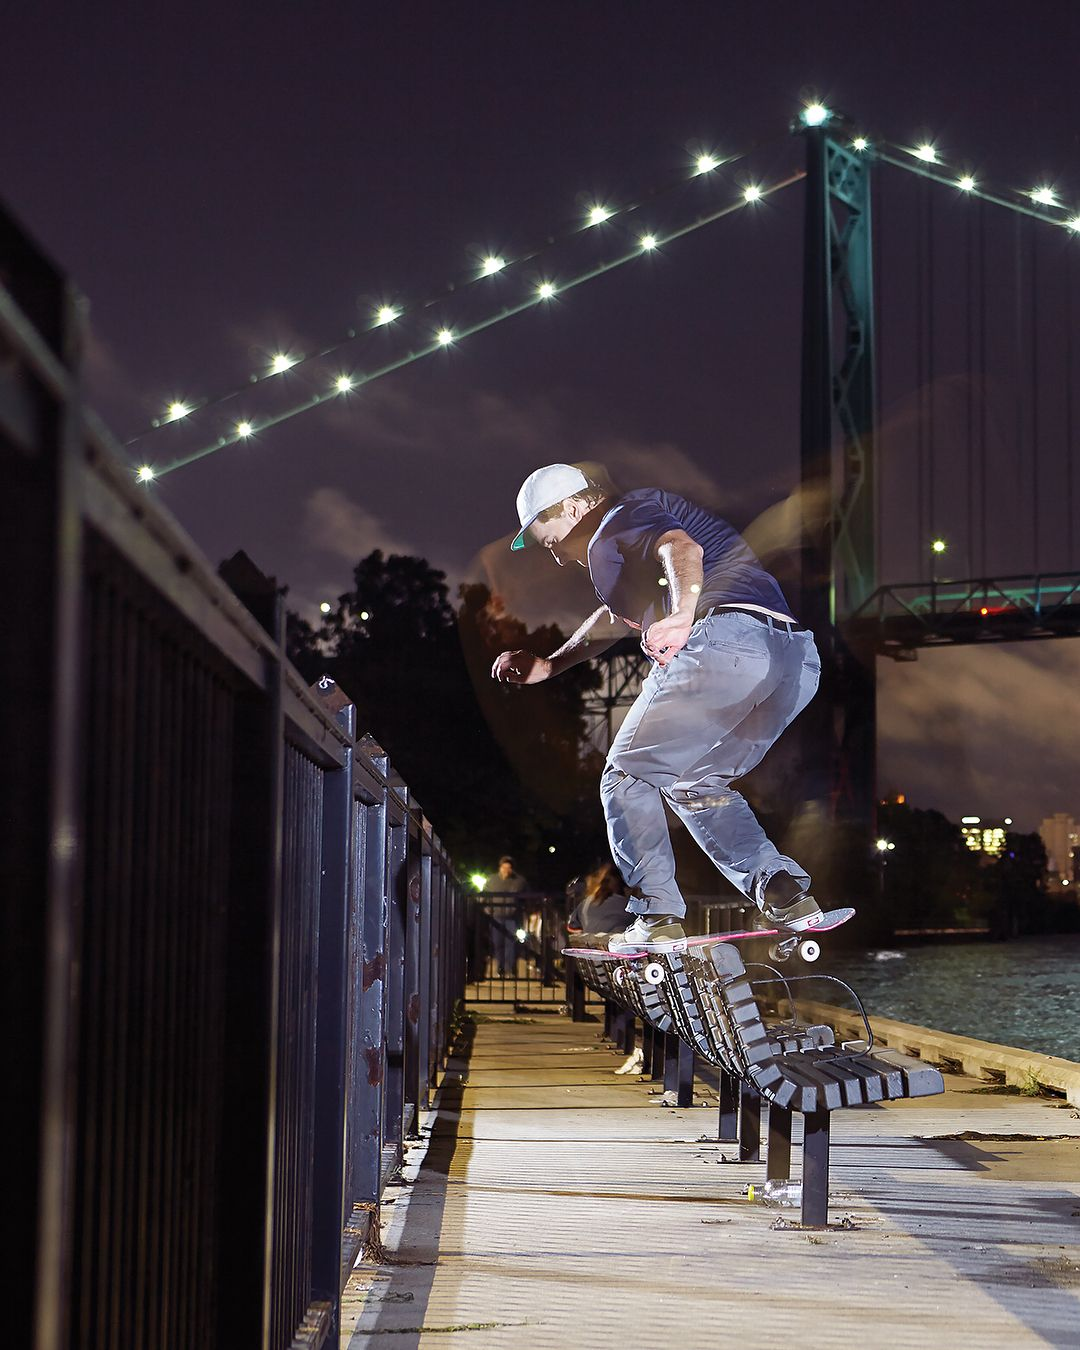 250 Mentions J Aime 13 Commentaires Medium Skate Mag Mediumskatemag Sur Instagram Justin Bohl Nollie Bs Lipslide Skateboard Pictures Skateboard Pics